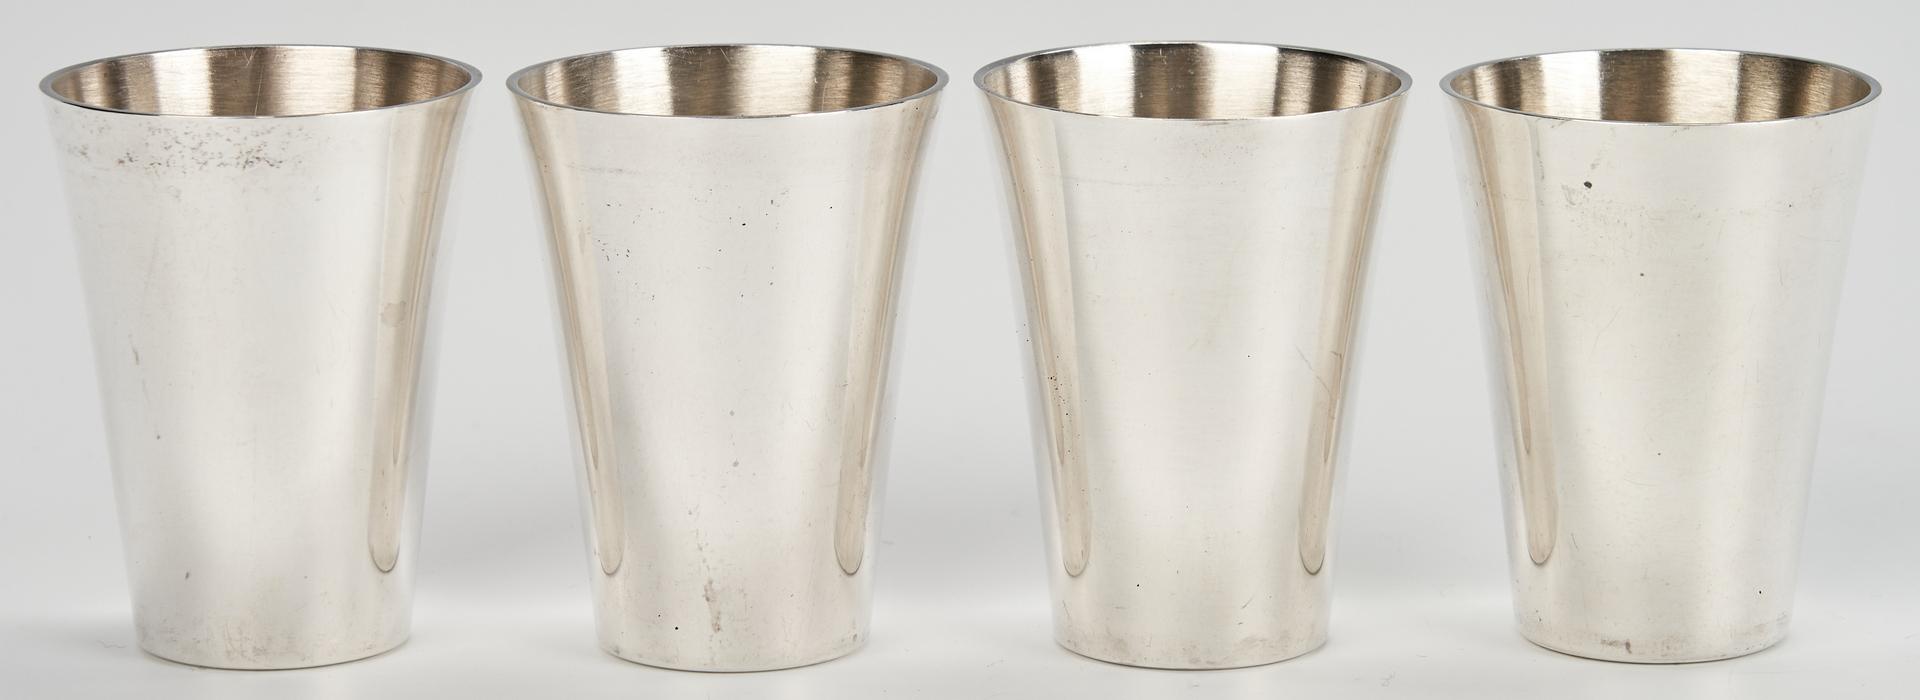 Lot 1030: 26 Sterling Champagnes, Cordials, Shot Glasses